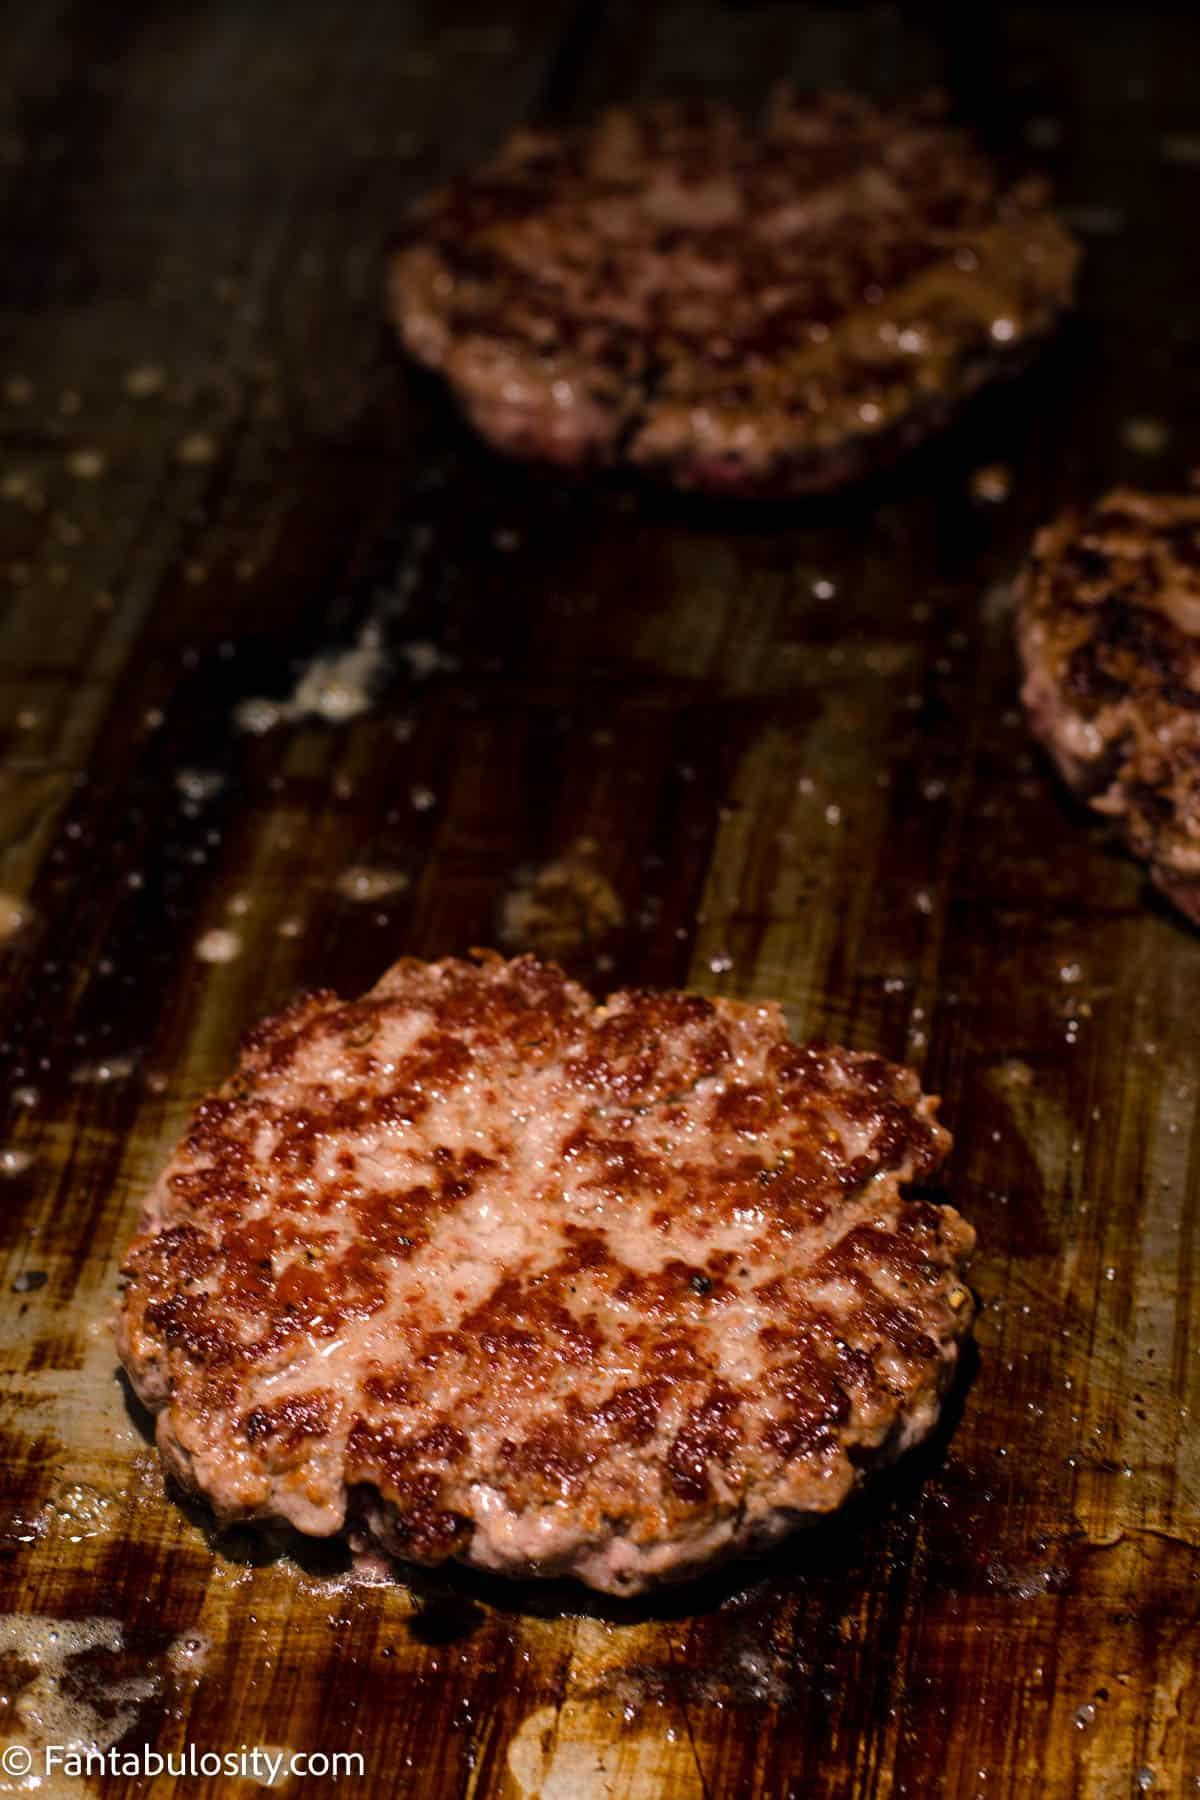 Flipped burger patties cooking